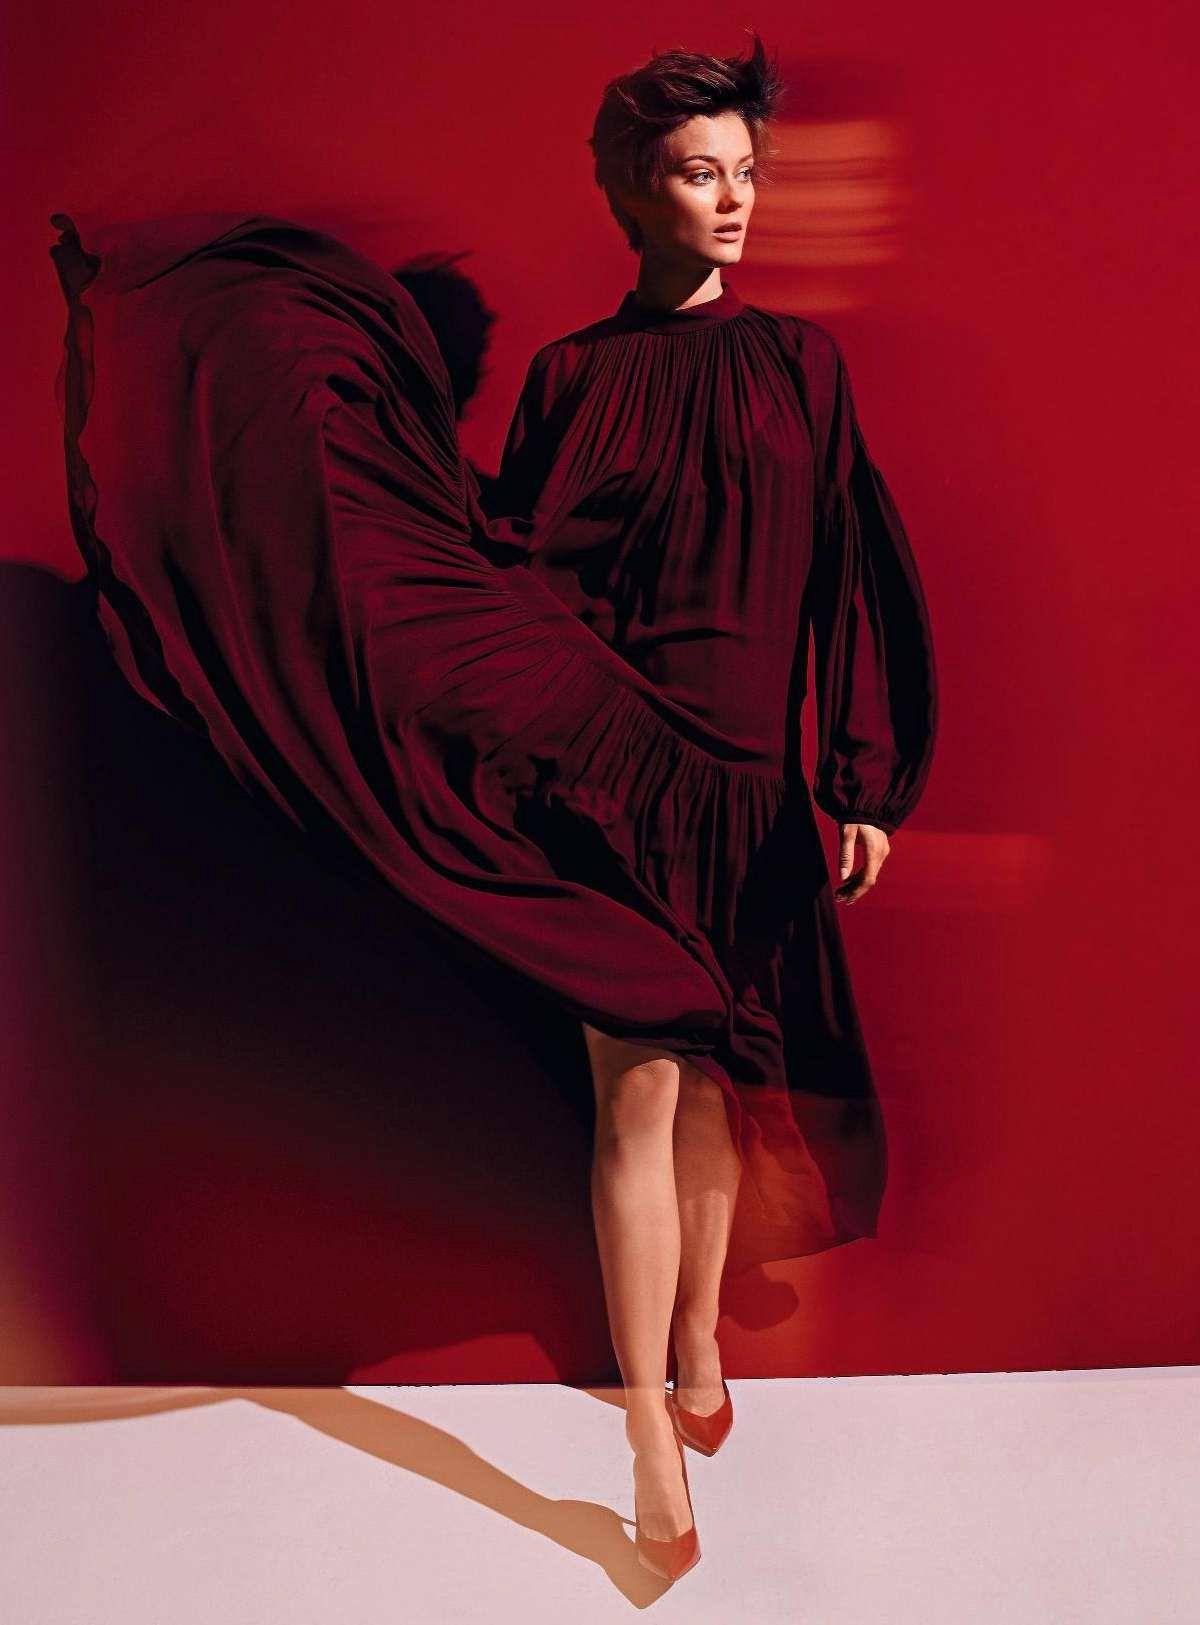 Style on Fire Monika Jagaciak by Regan Cameron for